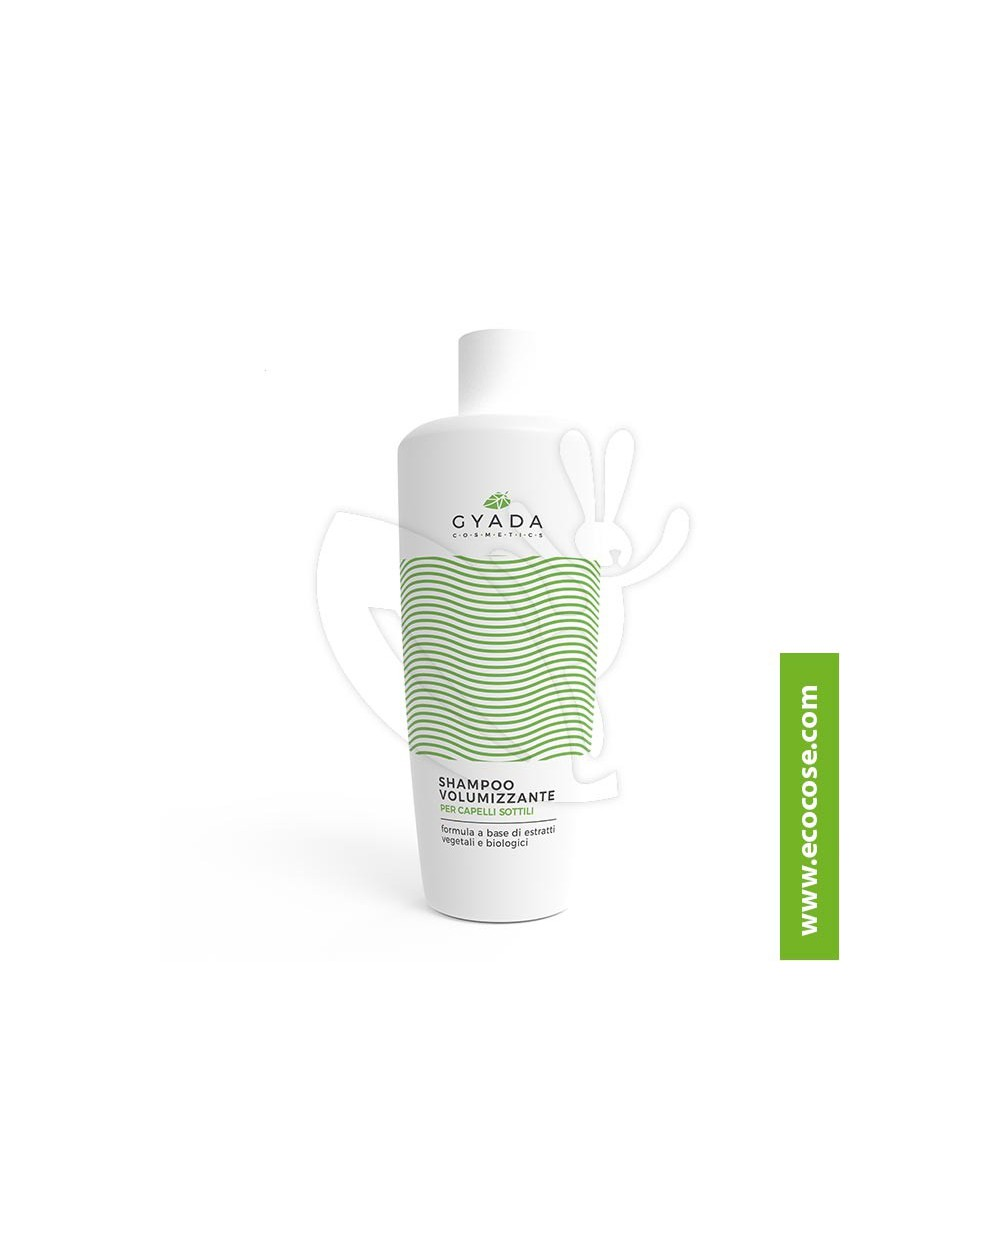 Gyada Cosmetics - Shampoo volumizzante